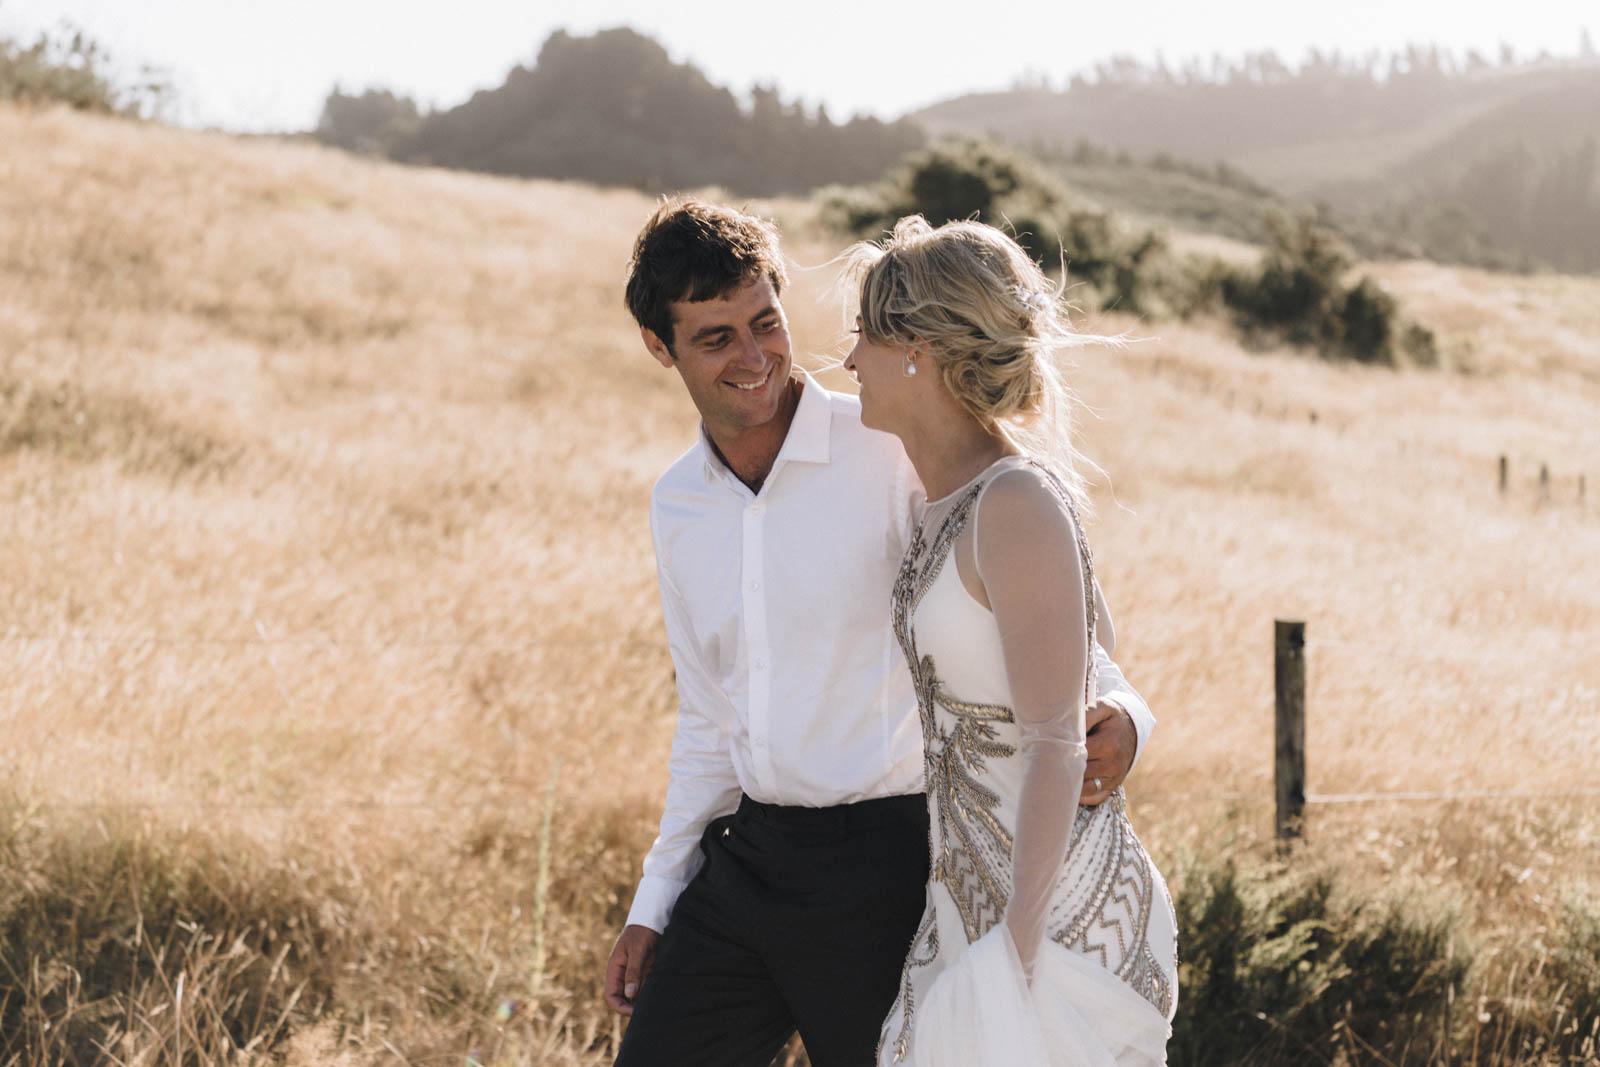 newfound-l-i-coromandel-wedding-photographer-1815-A9_04614